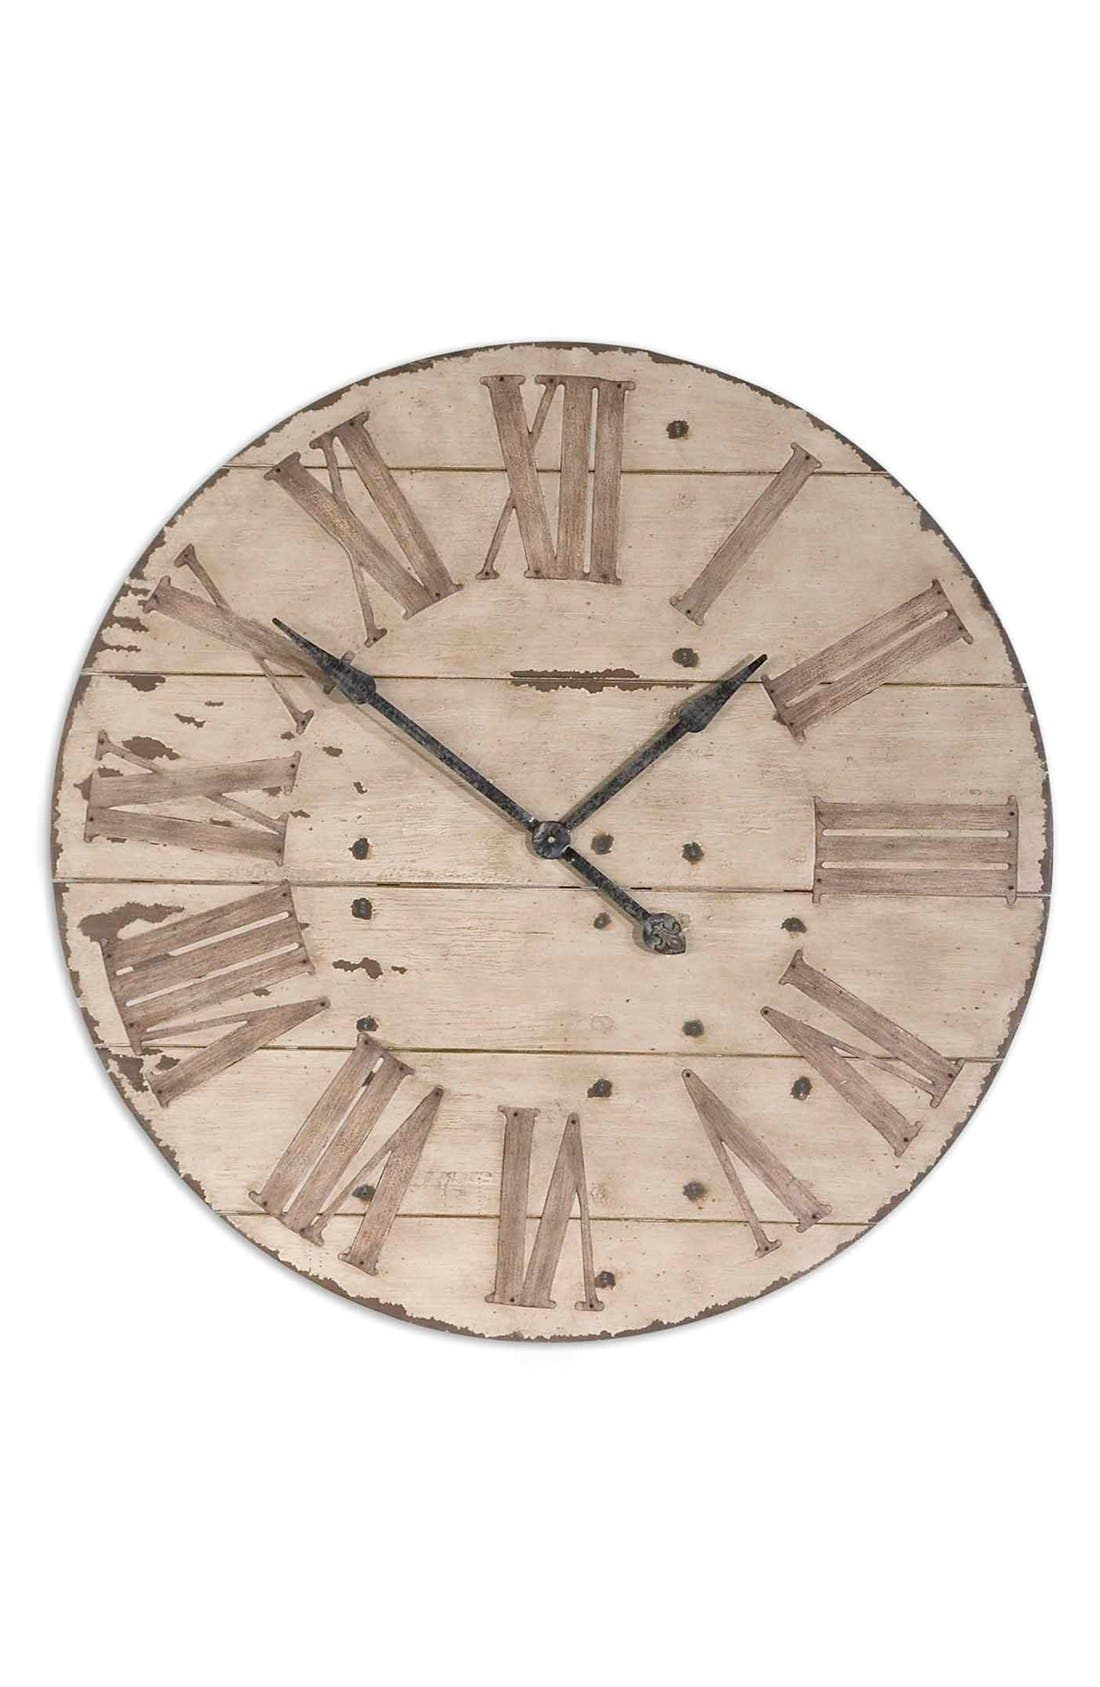 Alternate Image 1 Selected - Uttermost 'Harrington' Wall Clock